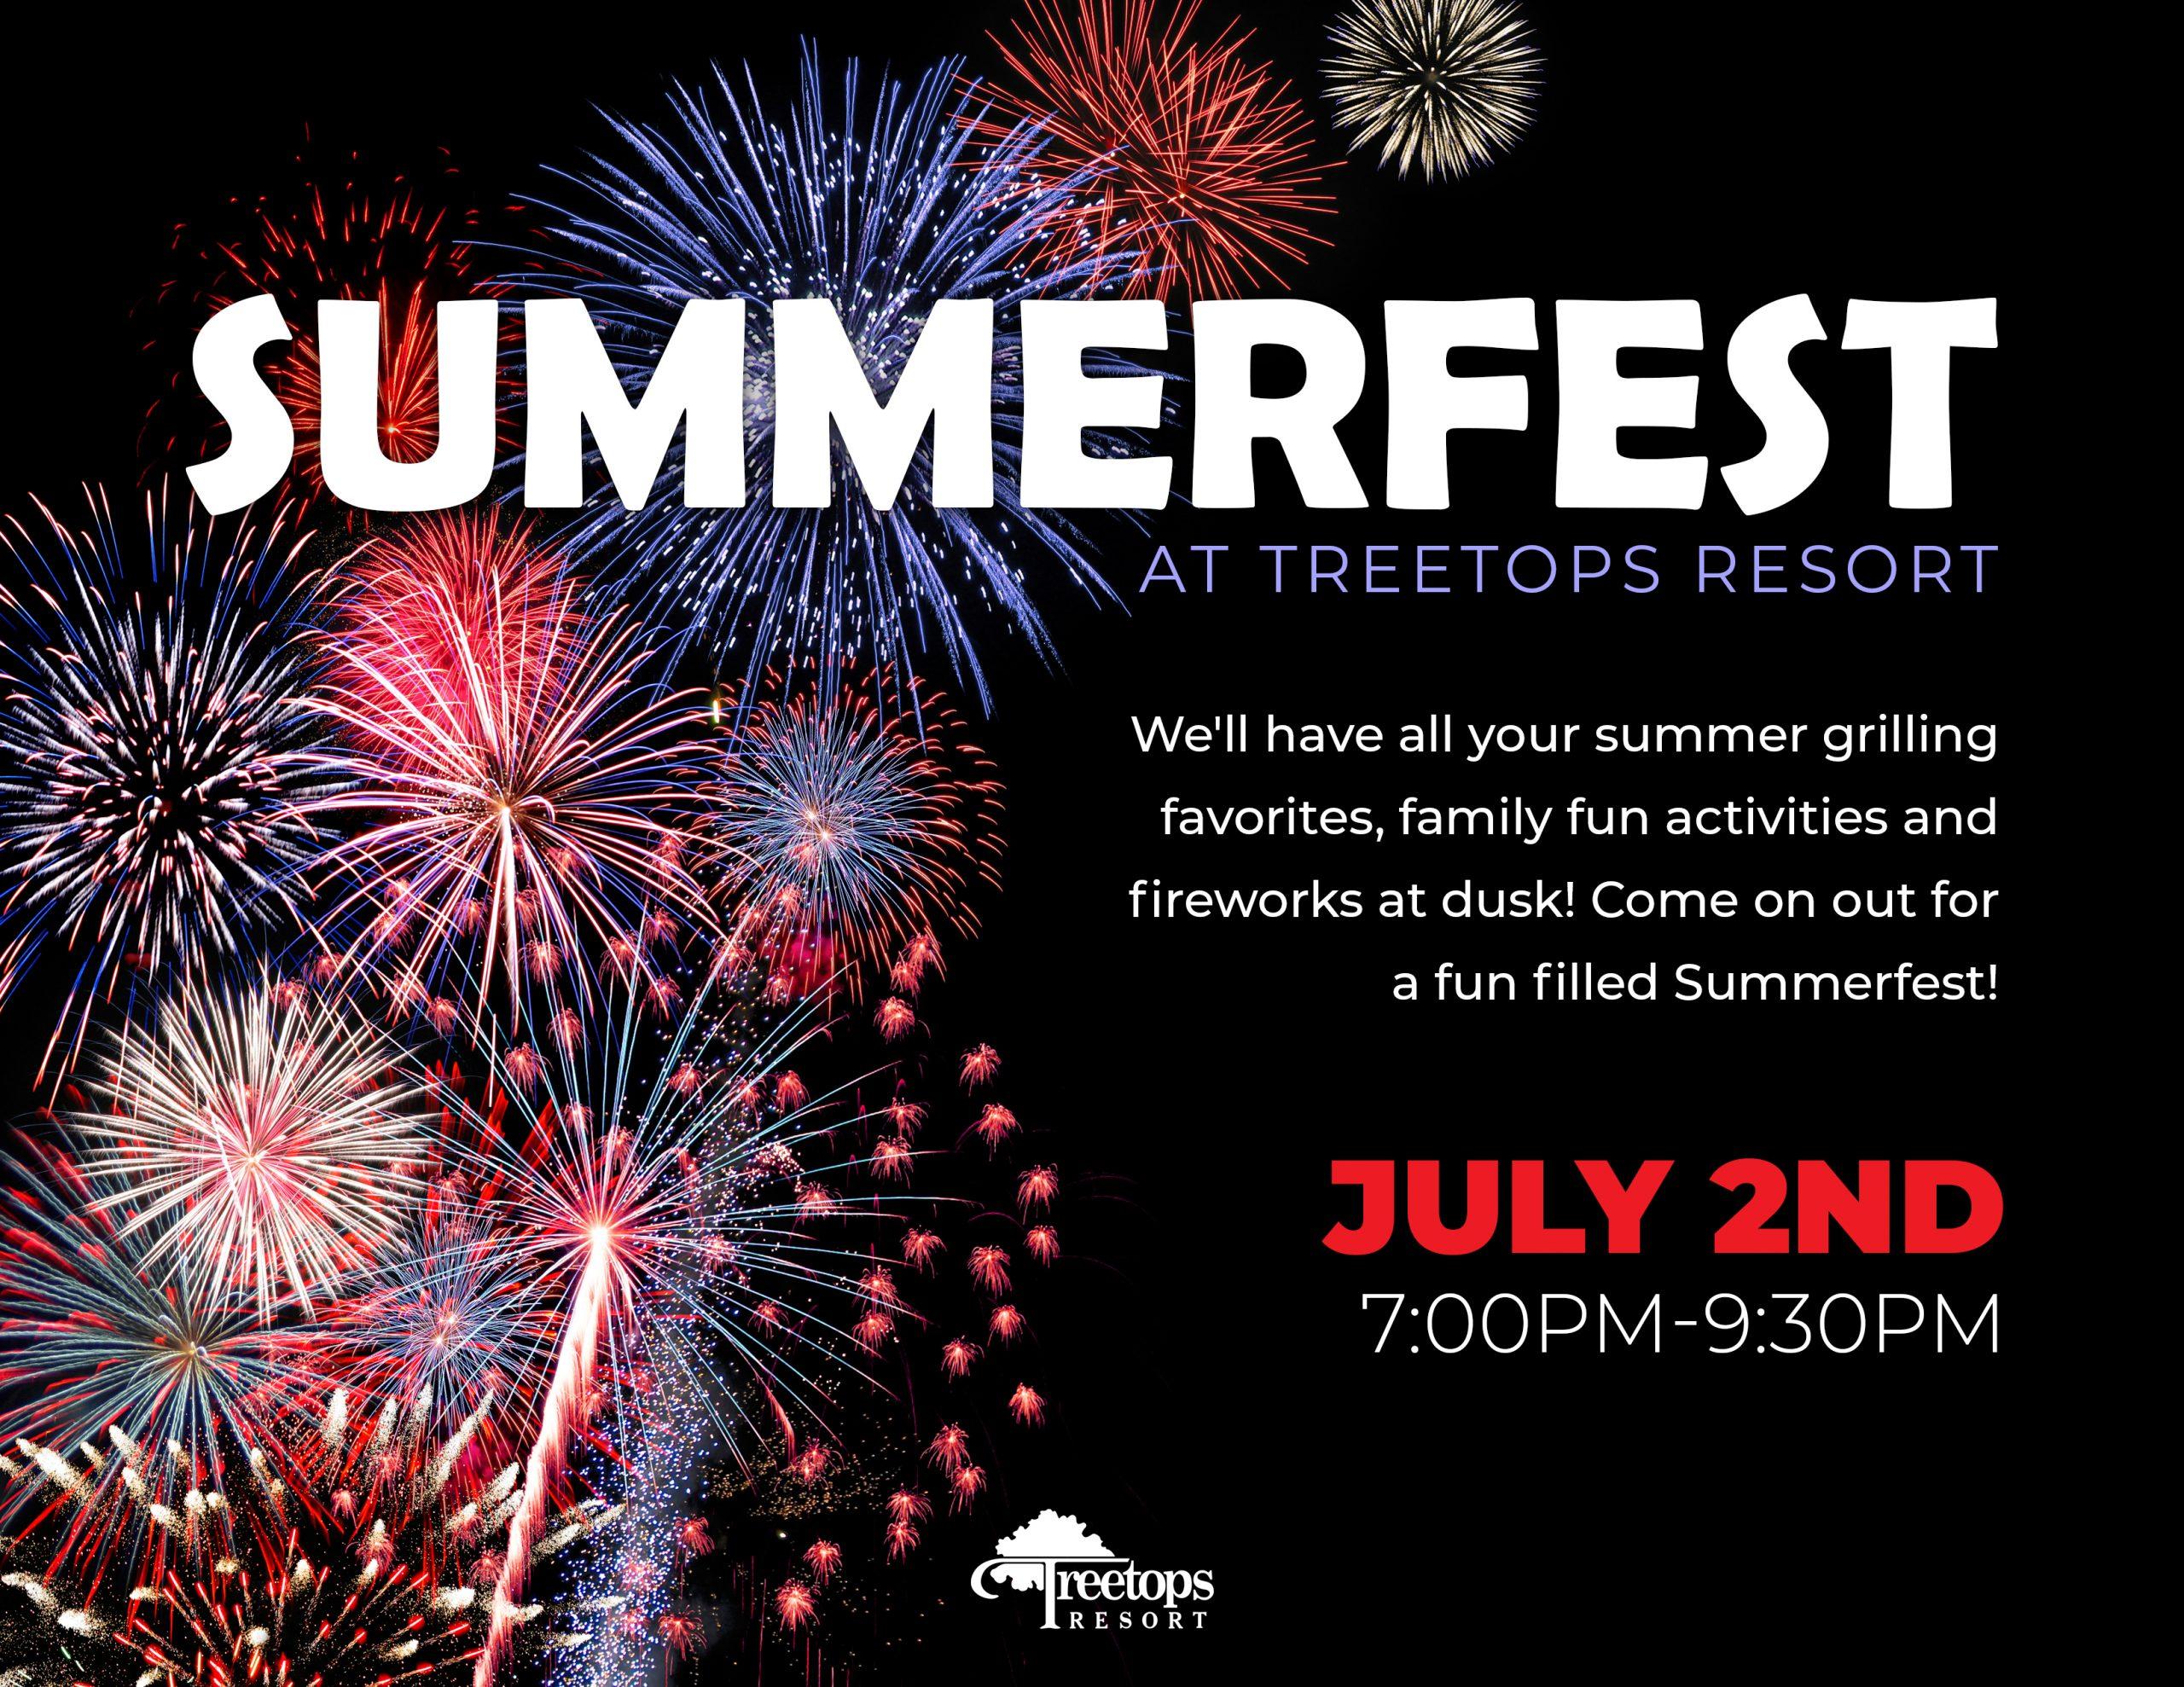 Summerfest at Treetops